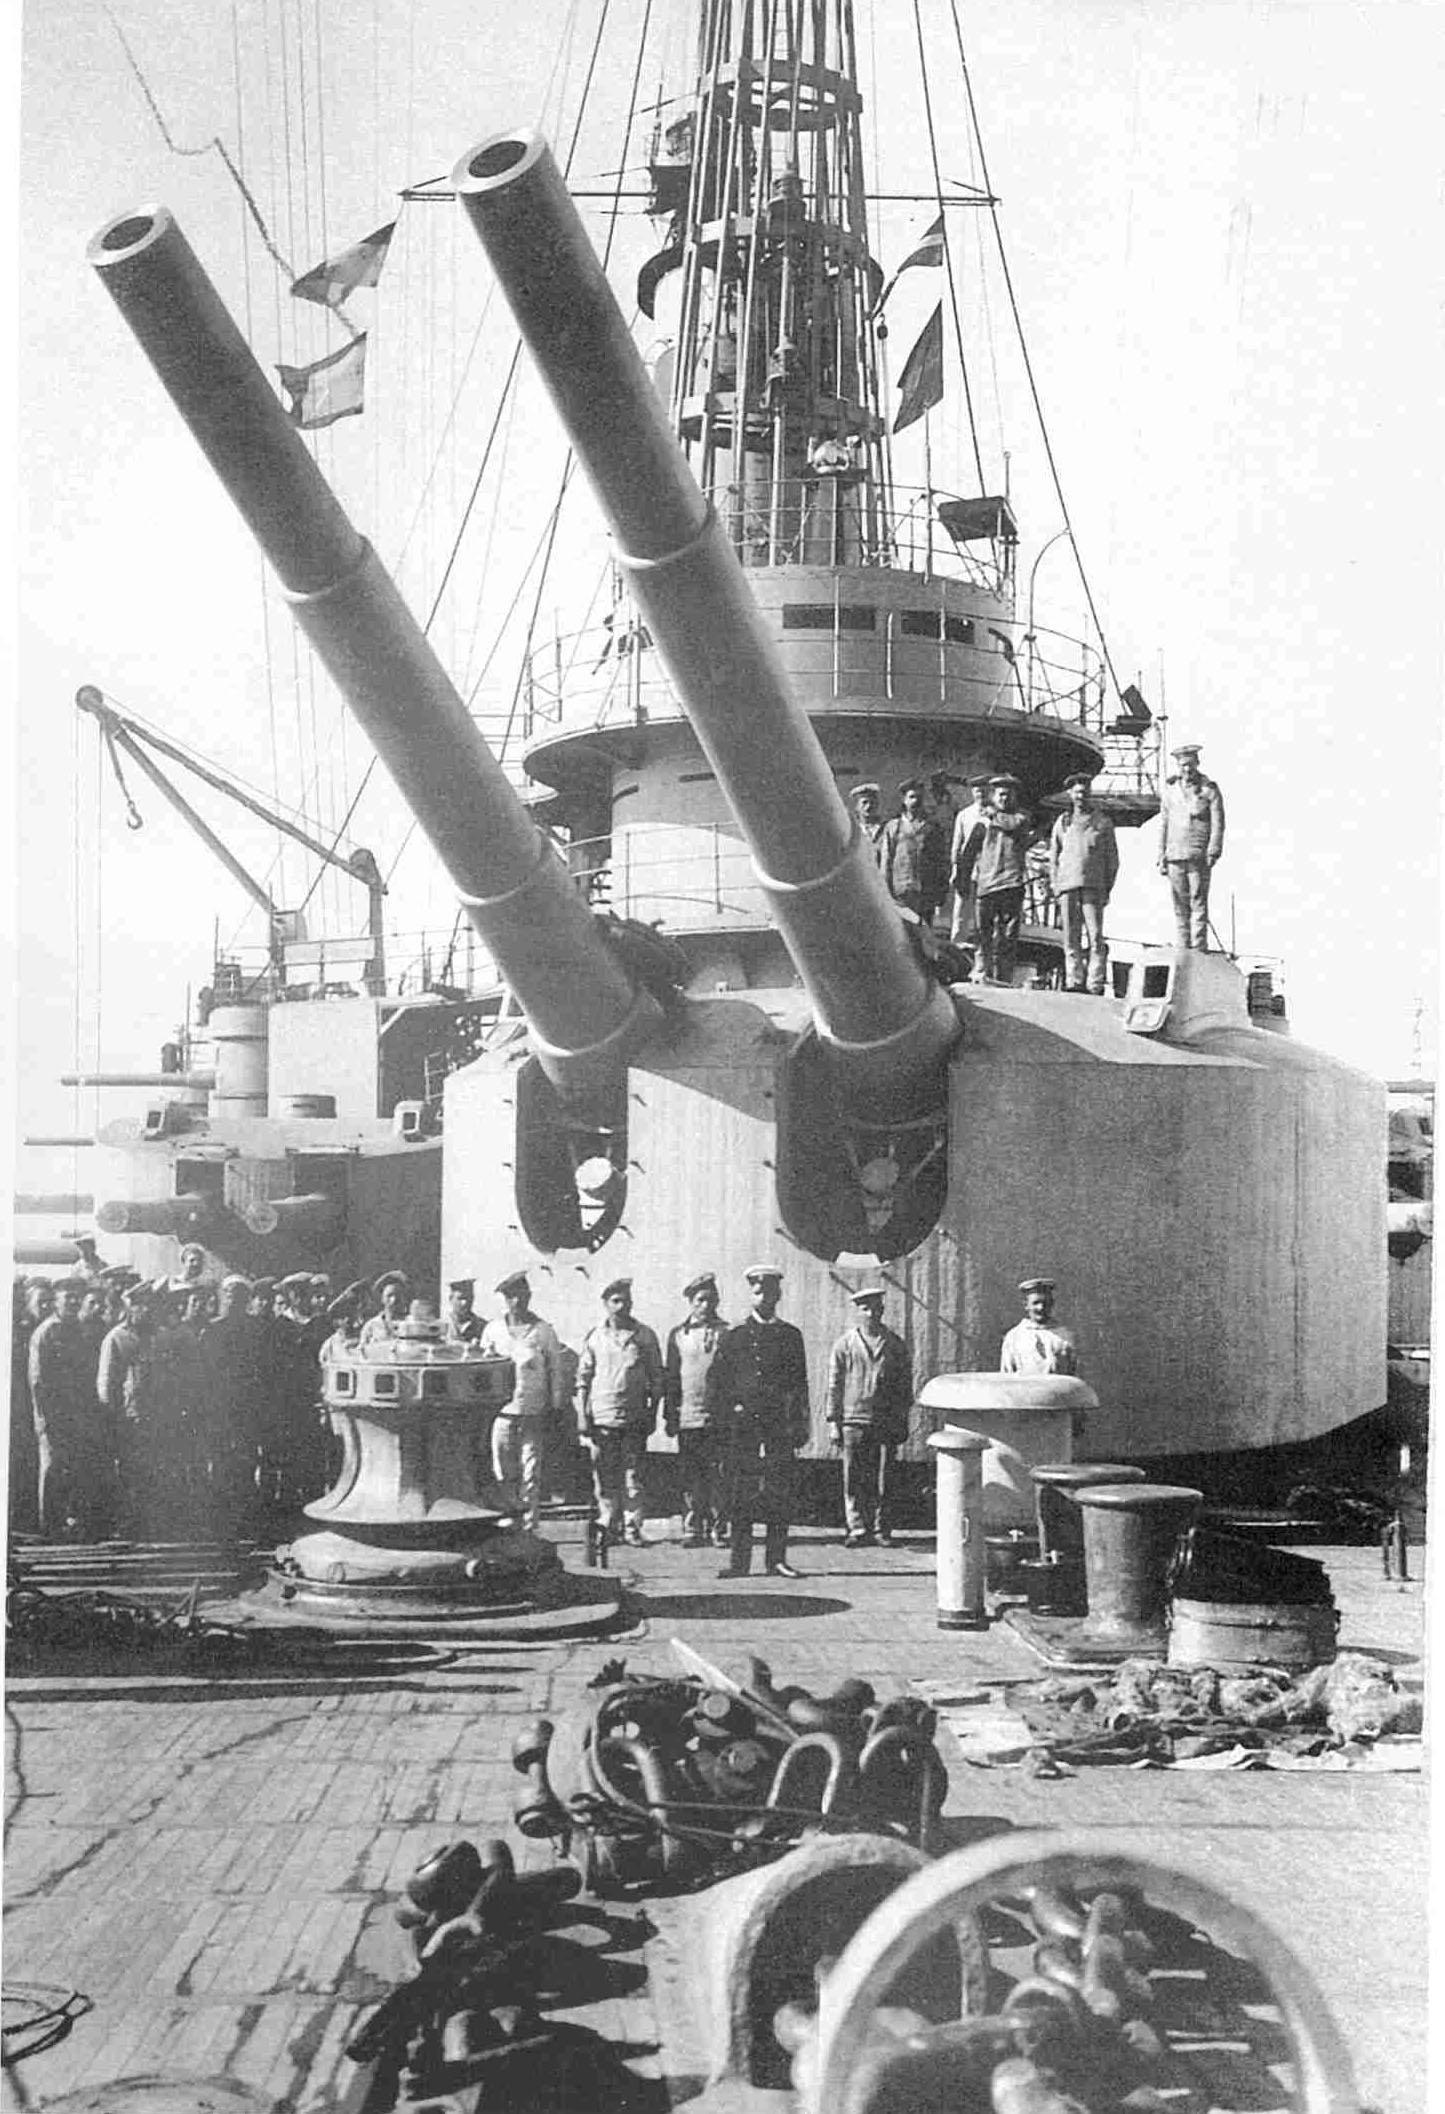 La flotta di Stalin:  Ordine di battaglia – parte IV di Gianluca Bertozzi